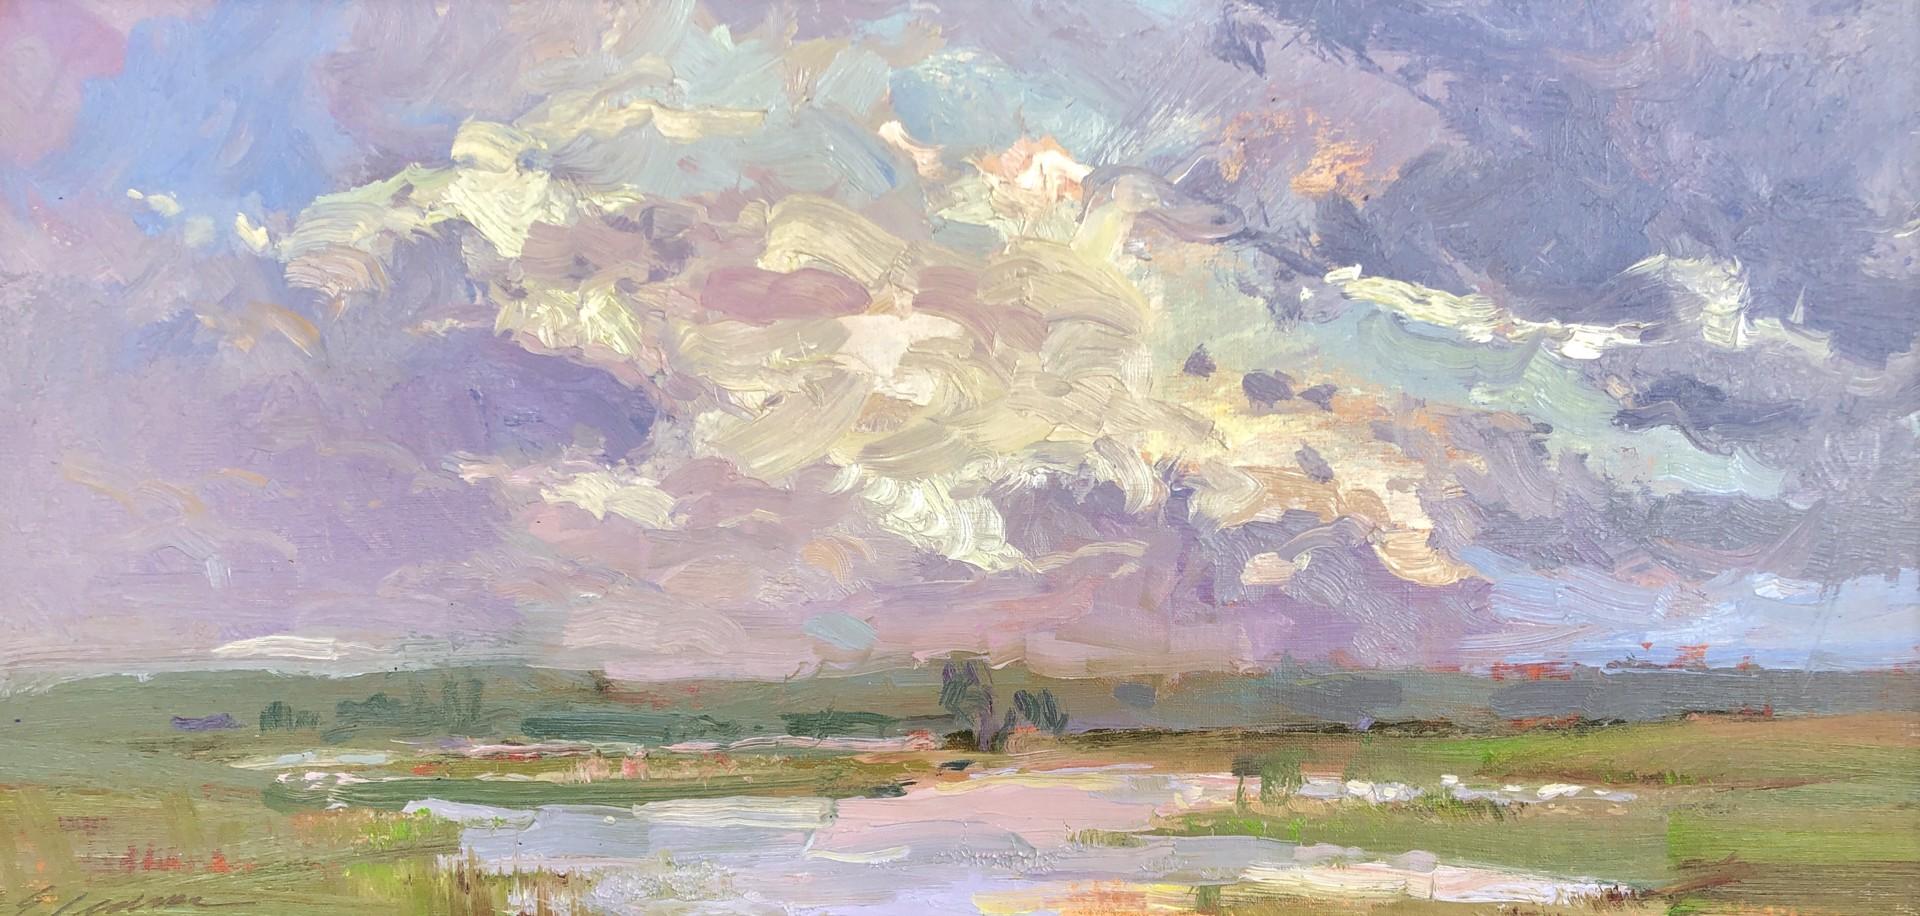 Big Sky by Eli Cedrone